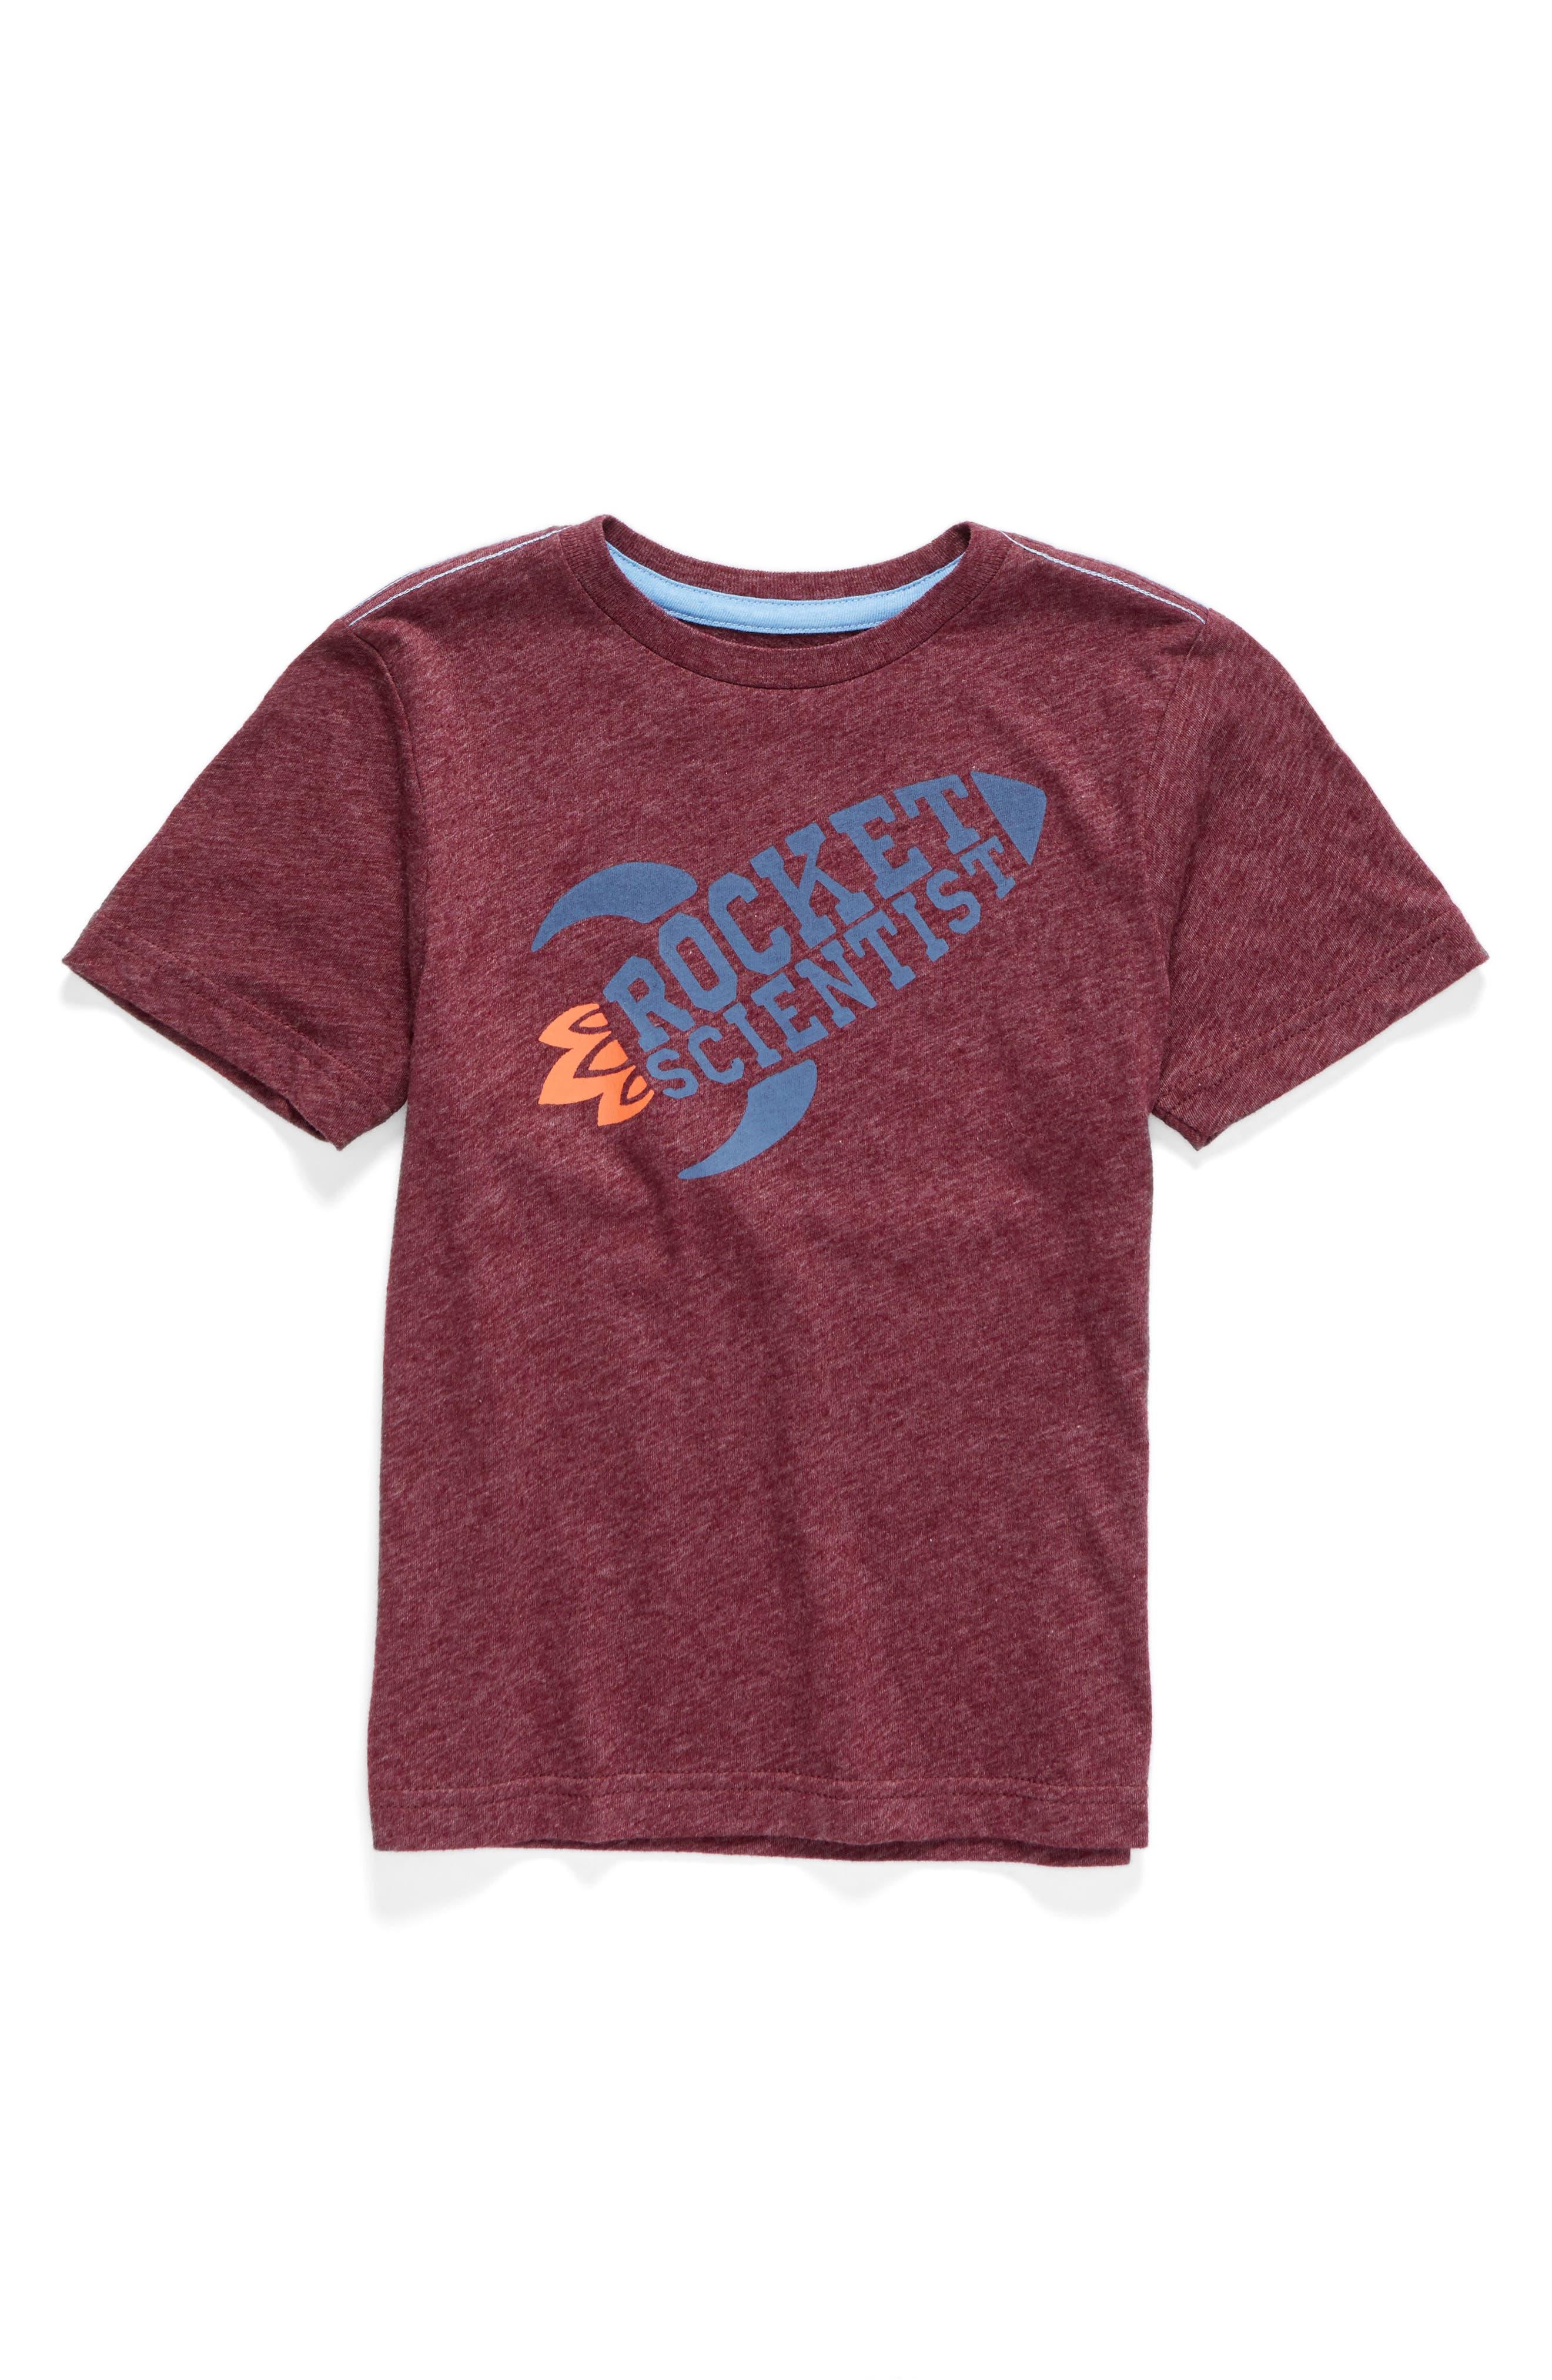 Tucker + Tate Graphic T-Shirt (Toddler Boys & Little Boys)